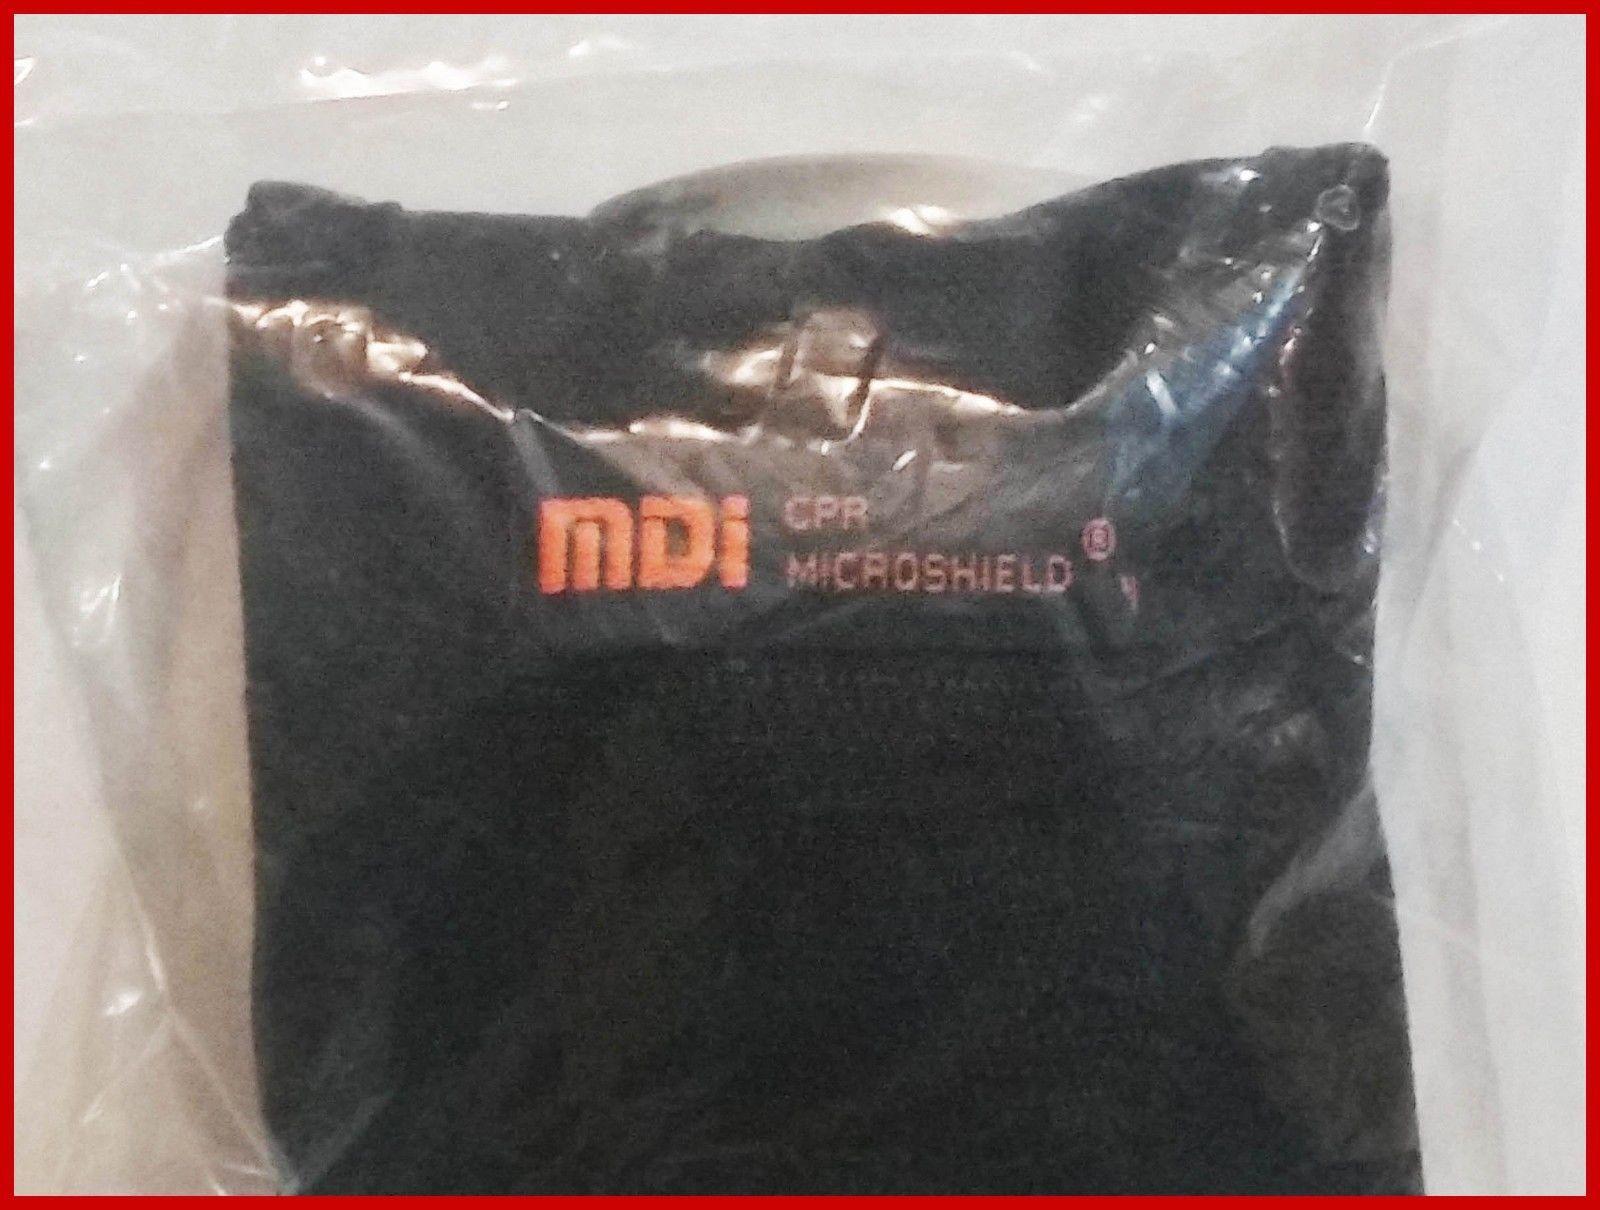 MDI CPR Microholster Nitrile Gloves Belt Holder Latex Free Cordura Case New | eBay